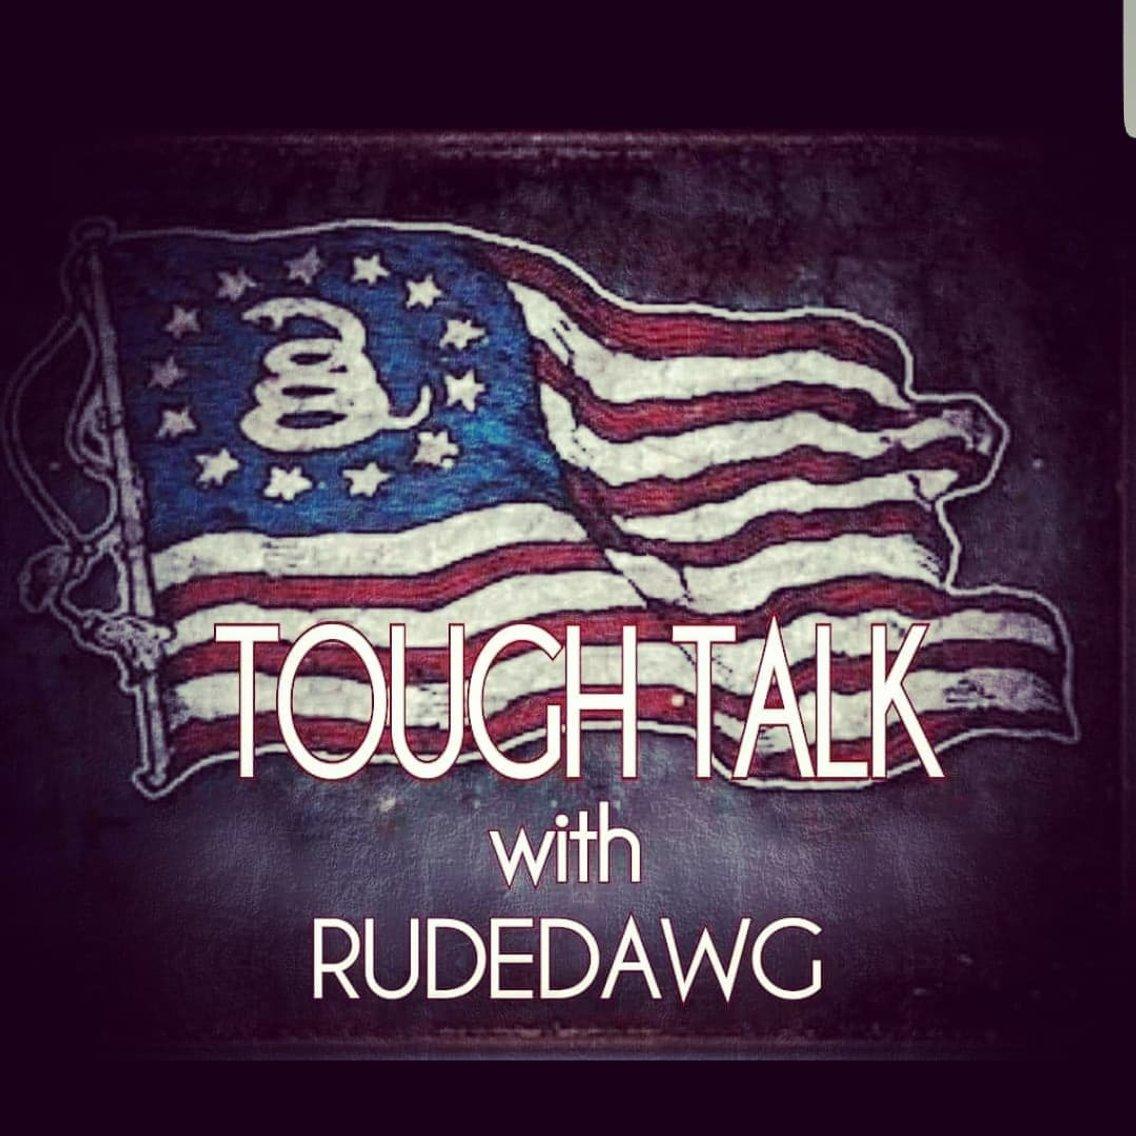 TOUGH TALK with RUDEDAWG - imagen de portada